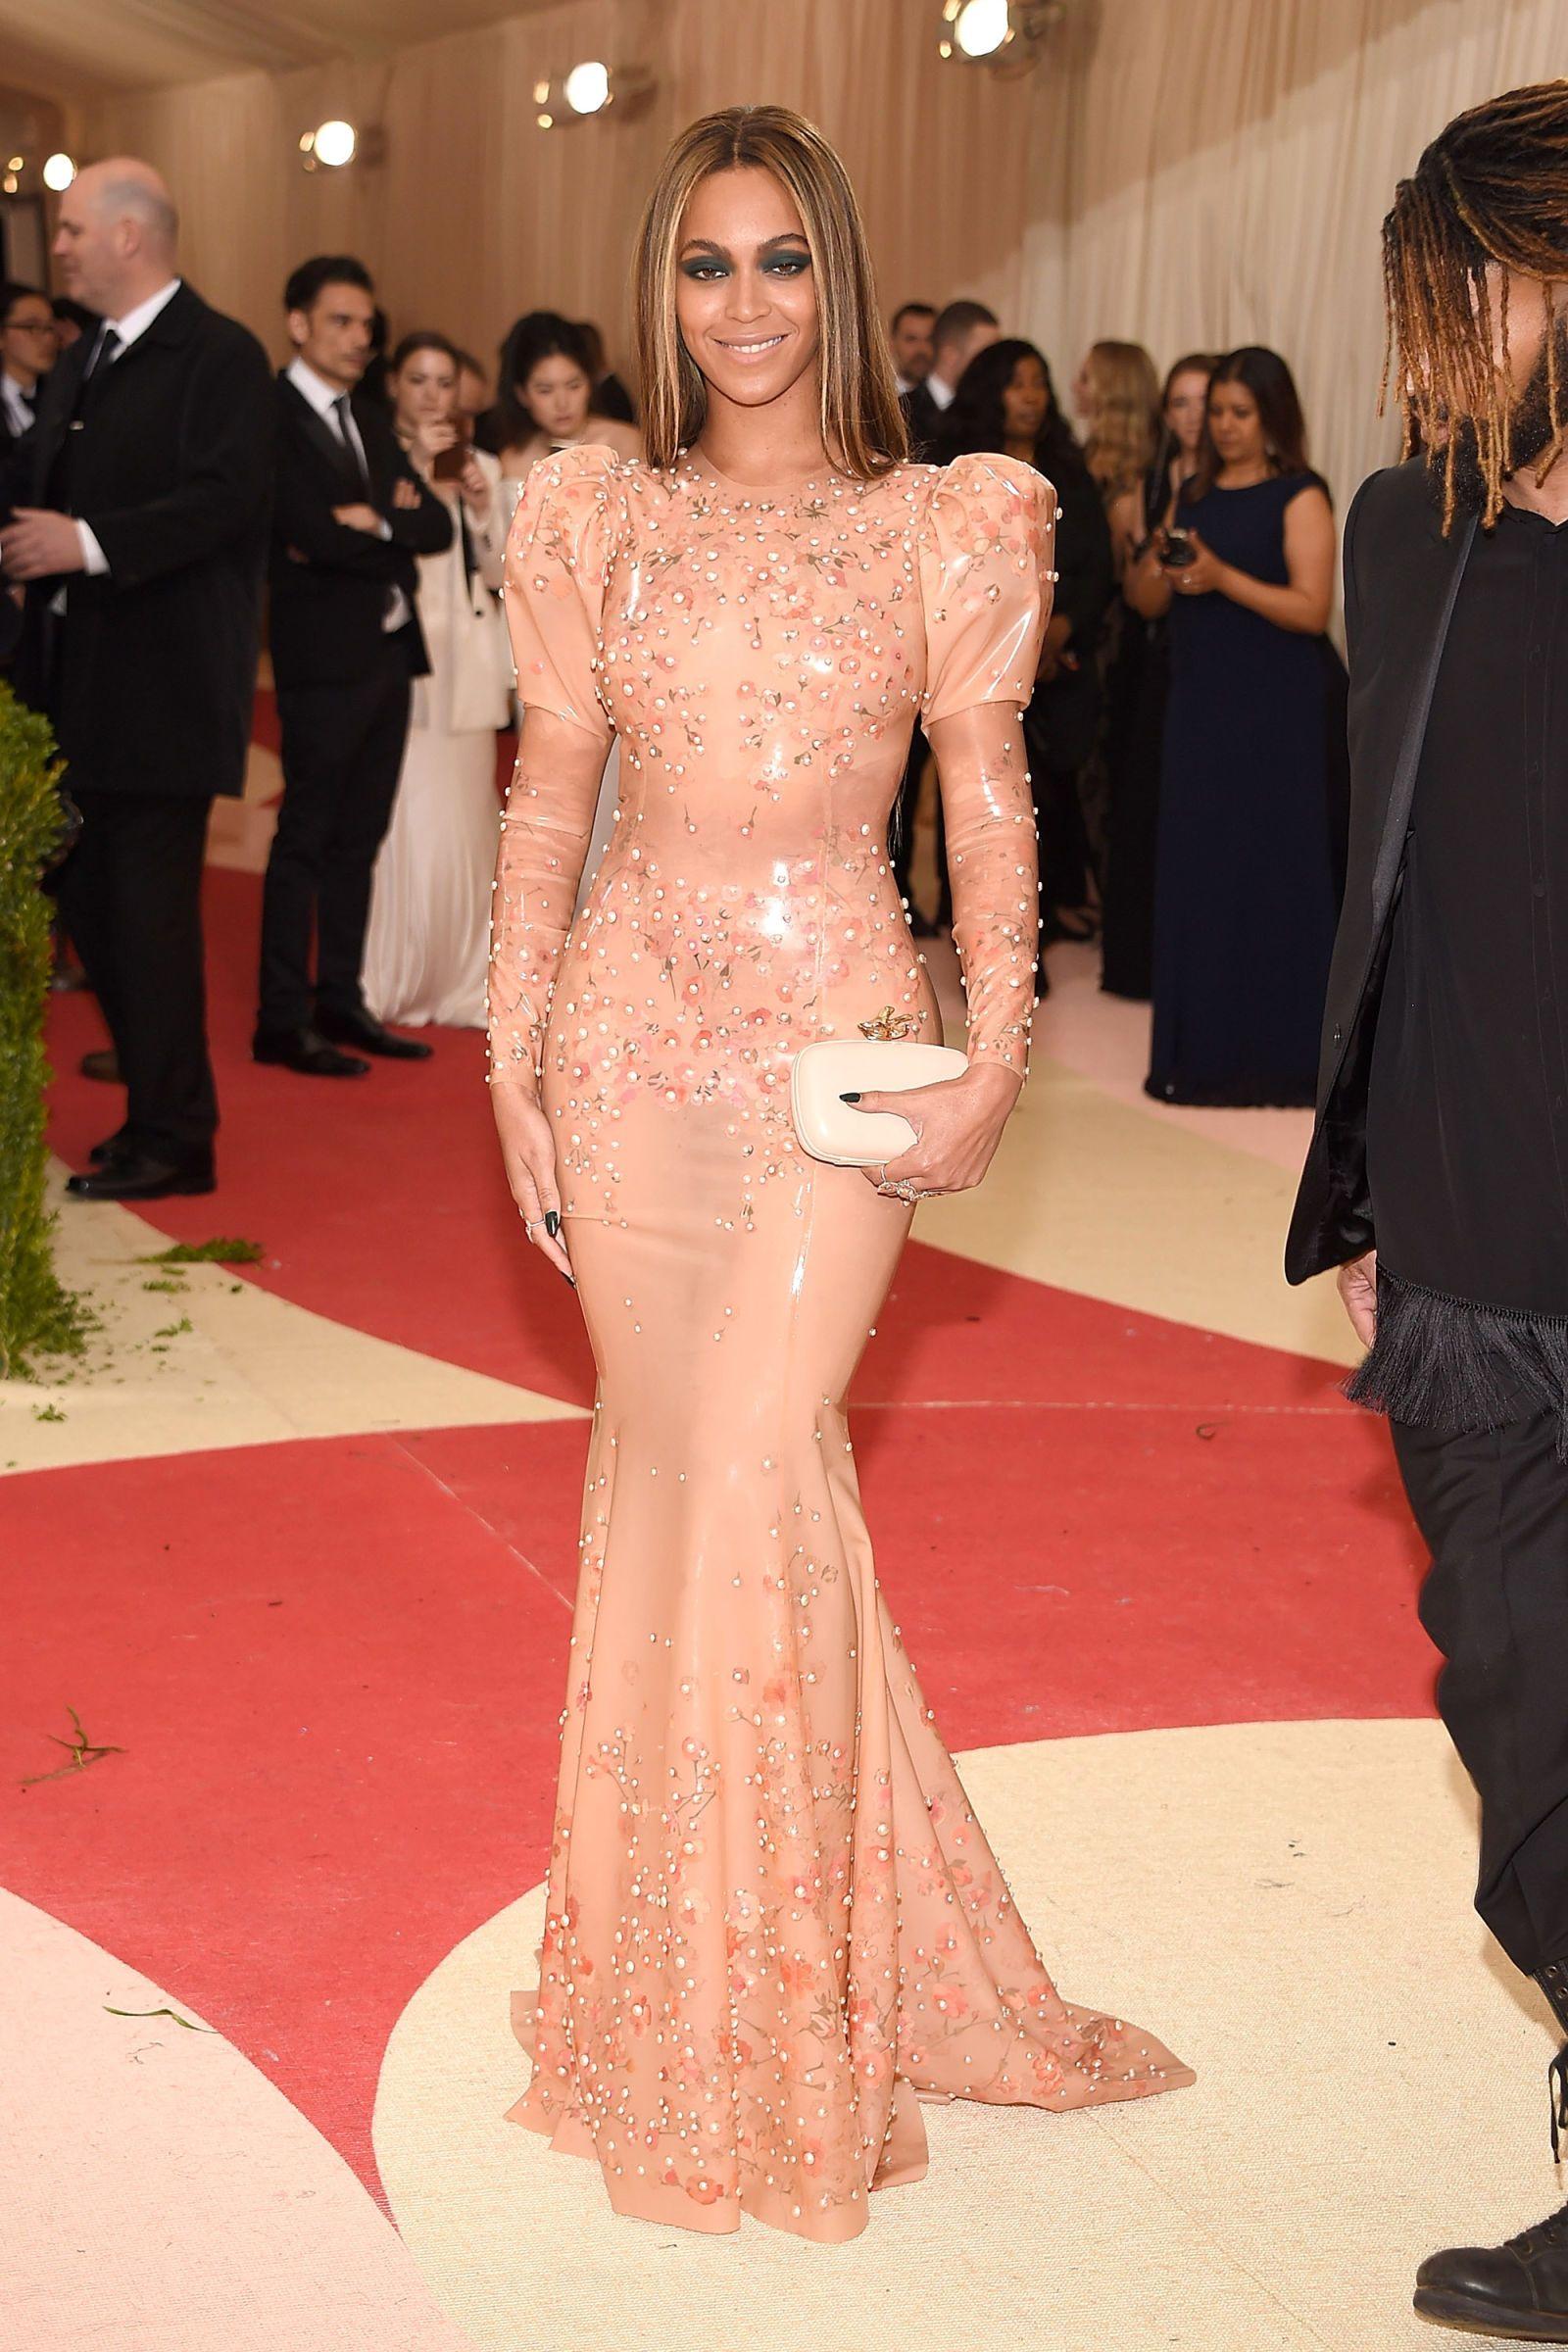 Beyoncé at the Met Gala: Fashions Biggest Night Has